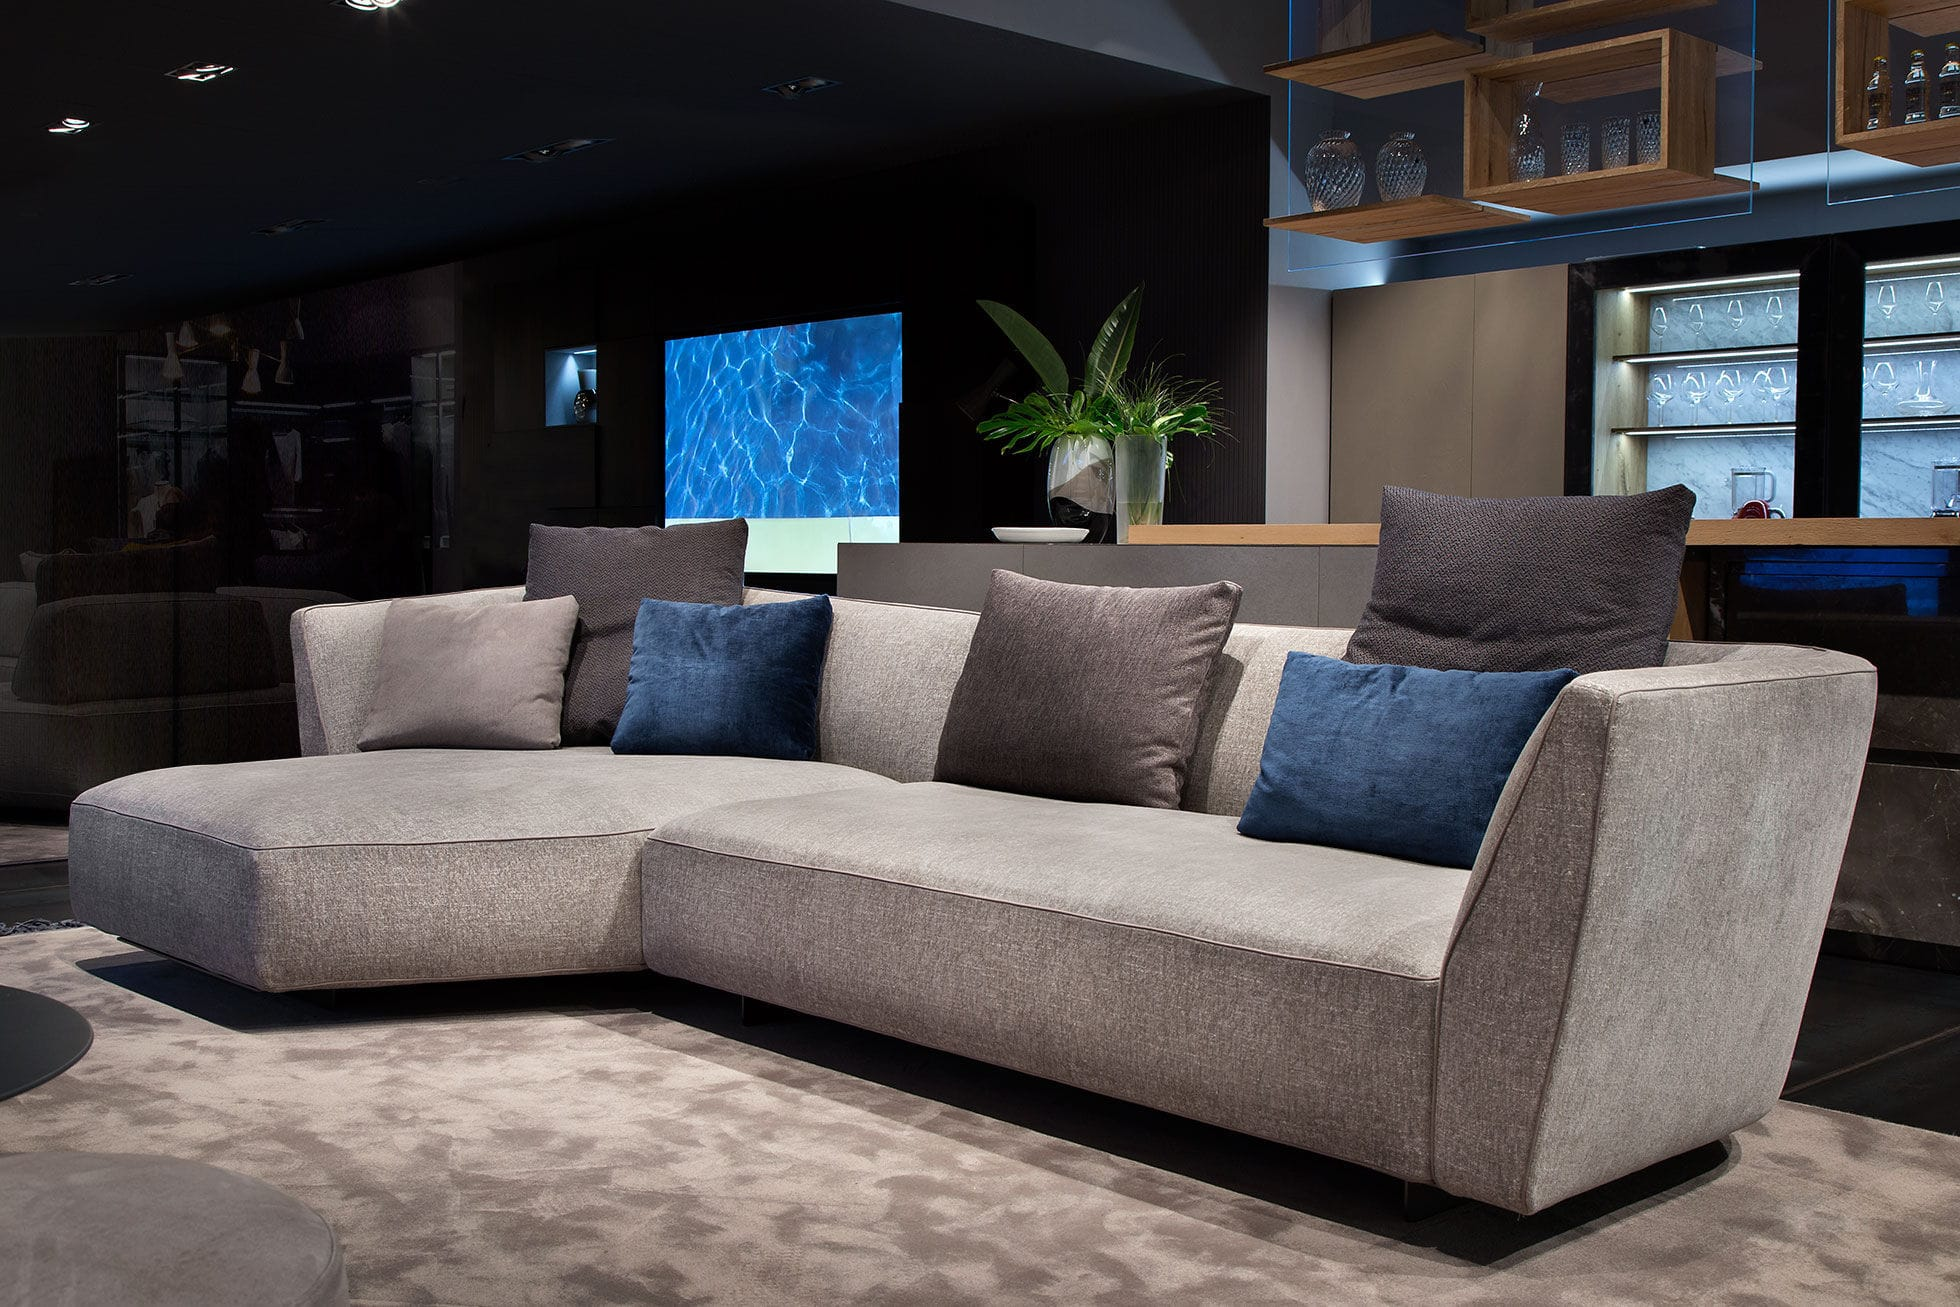 Sofa modern stoff grau  Modulierbares Sofa / modern / Stoff / braun - CLOUD - art nova srl